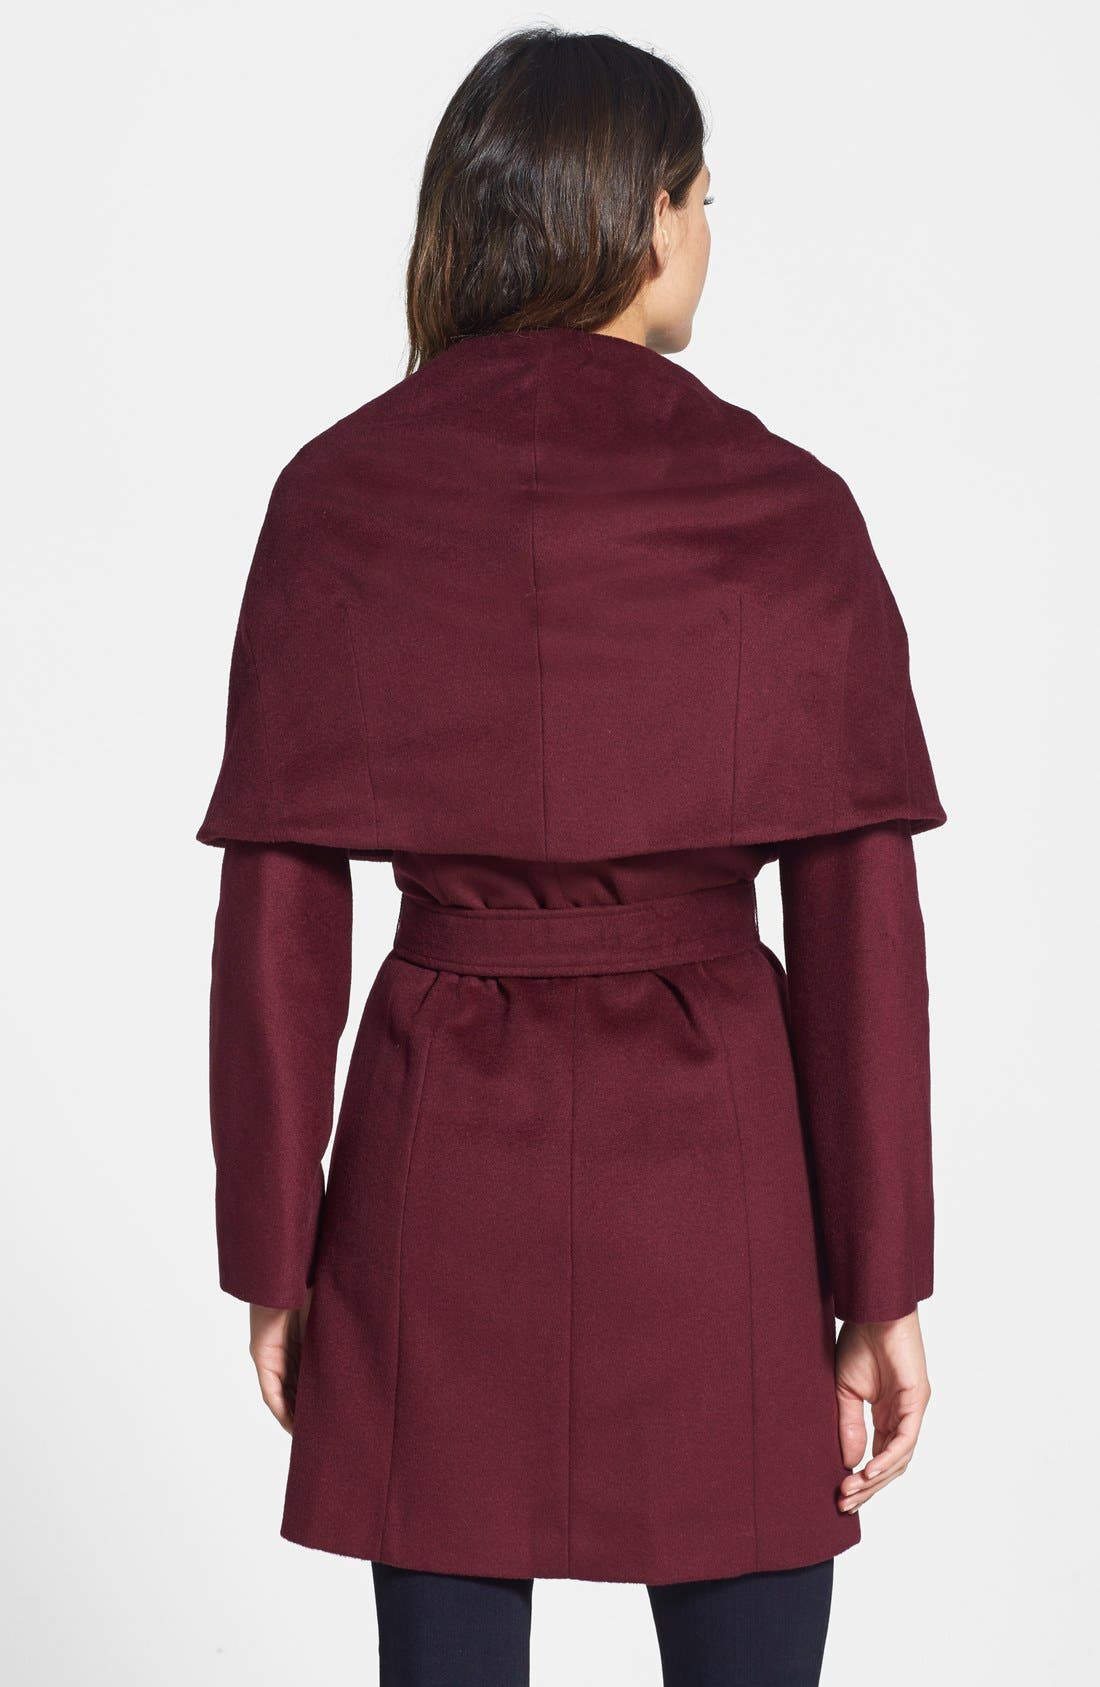 T Tahari Wool Blend Belted Wrap Coat,                             Alternate thumbnail 20, color,